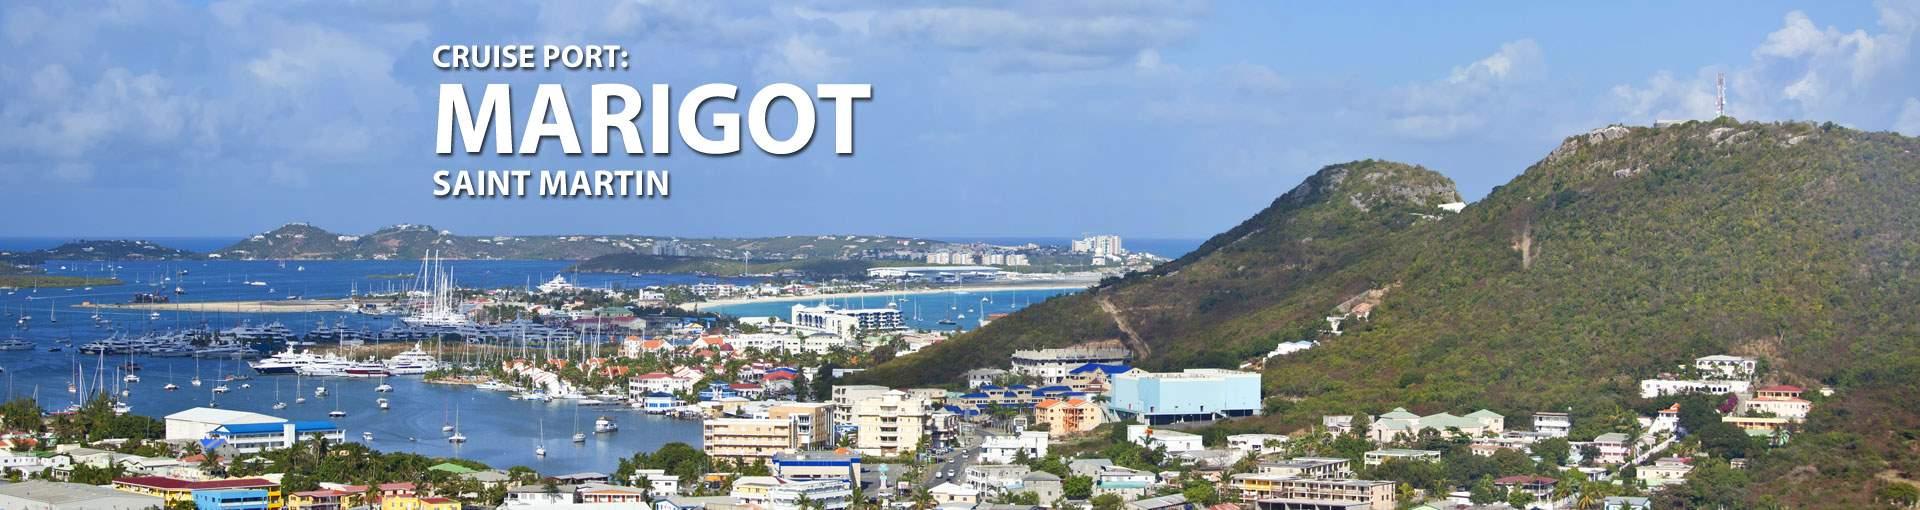 Cruises to Marigot, Saint Martin